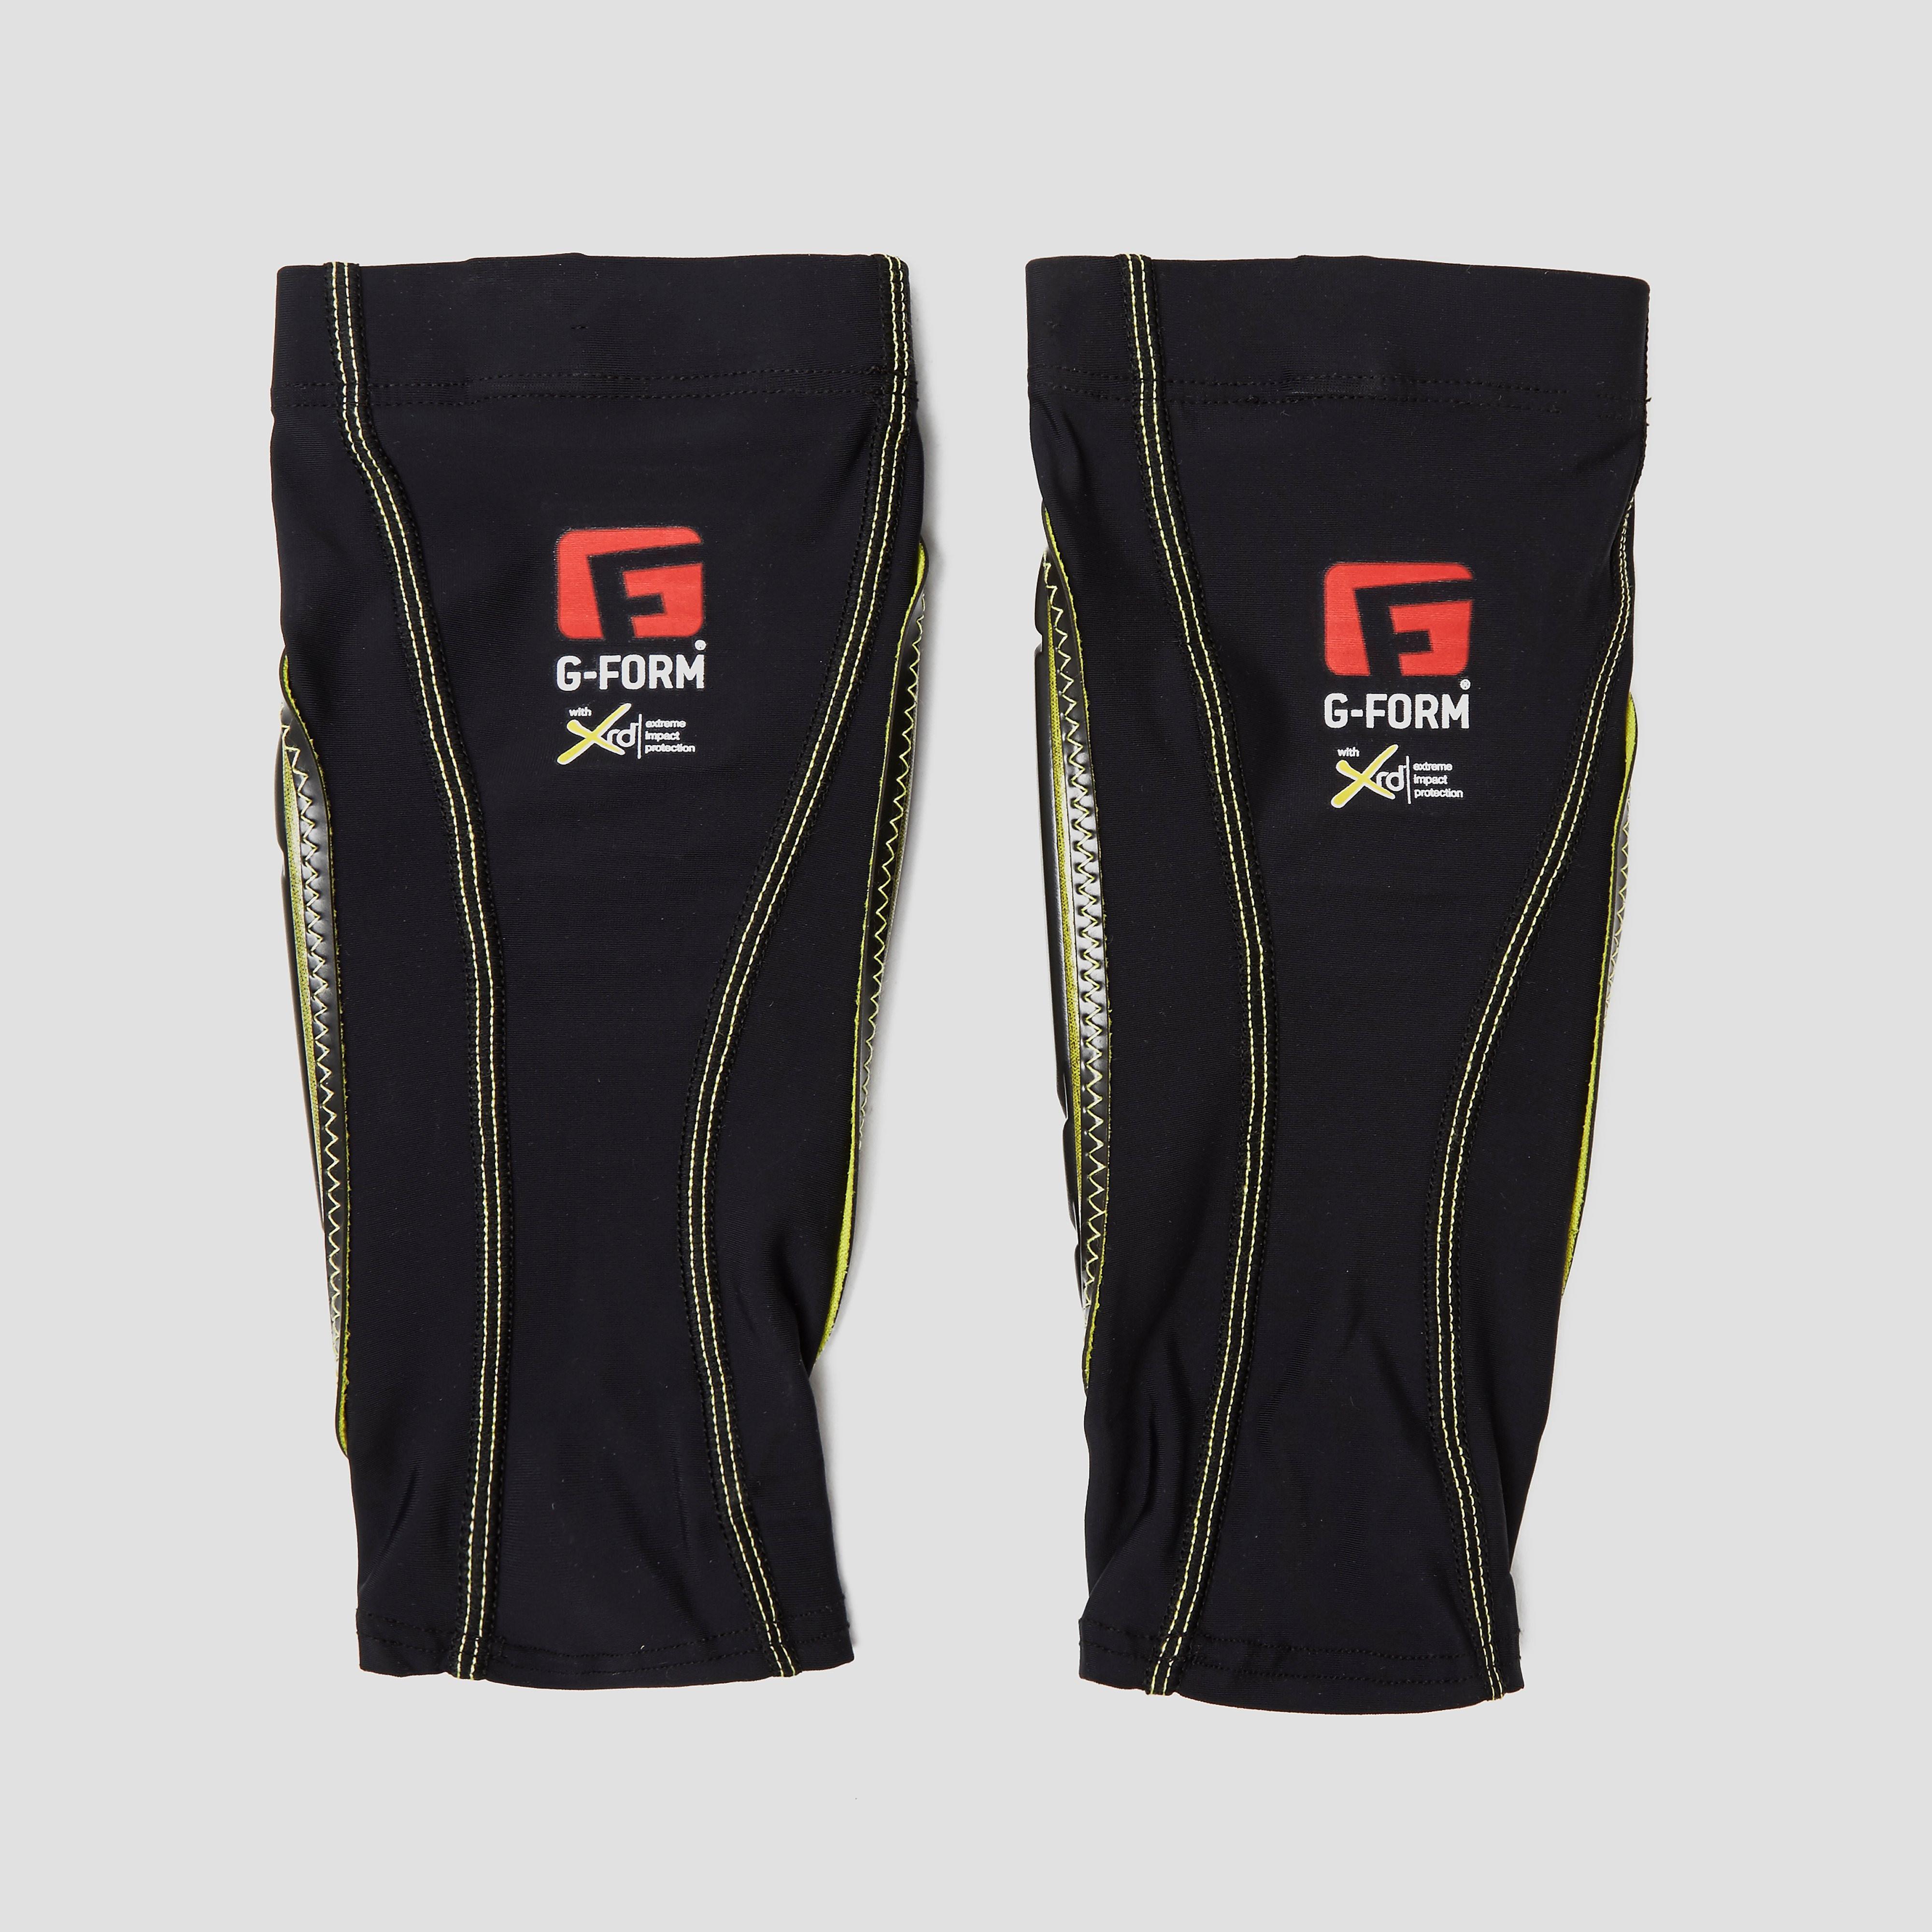 G-Form Pro-S Elite Shin Guards